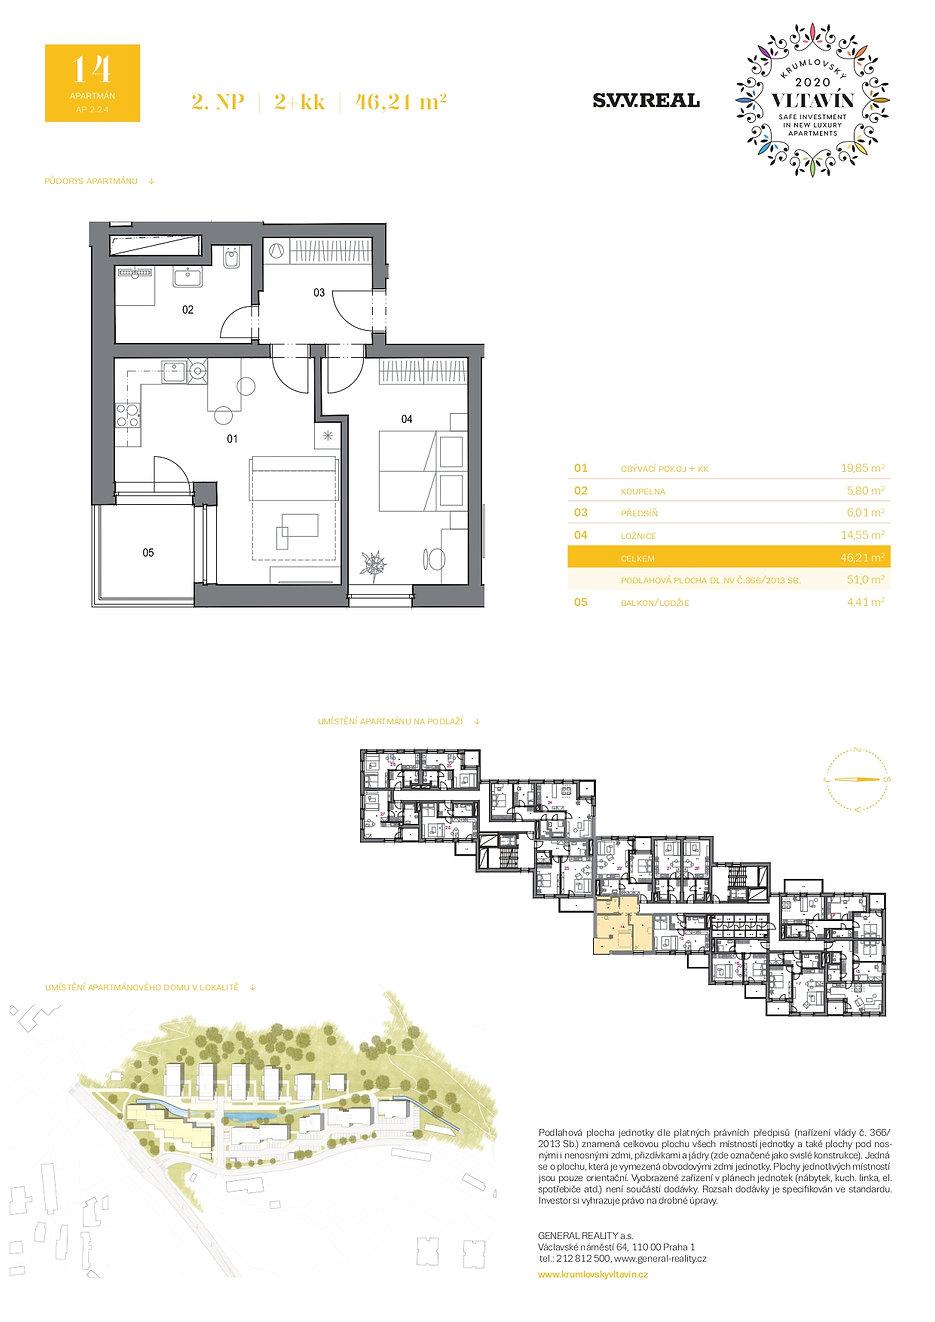 GR_krumlovsky-vltavin_bytove-karty-apartmany_2NP_A14_page-0001.jpg